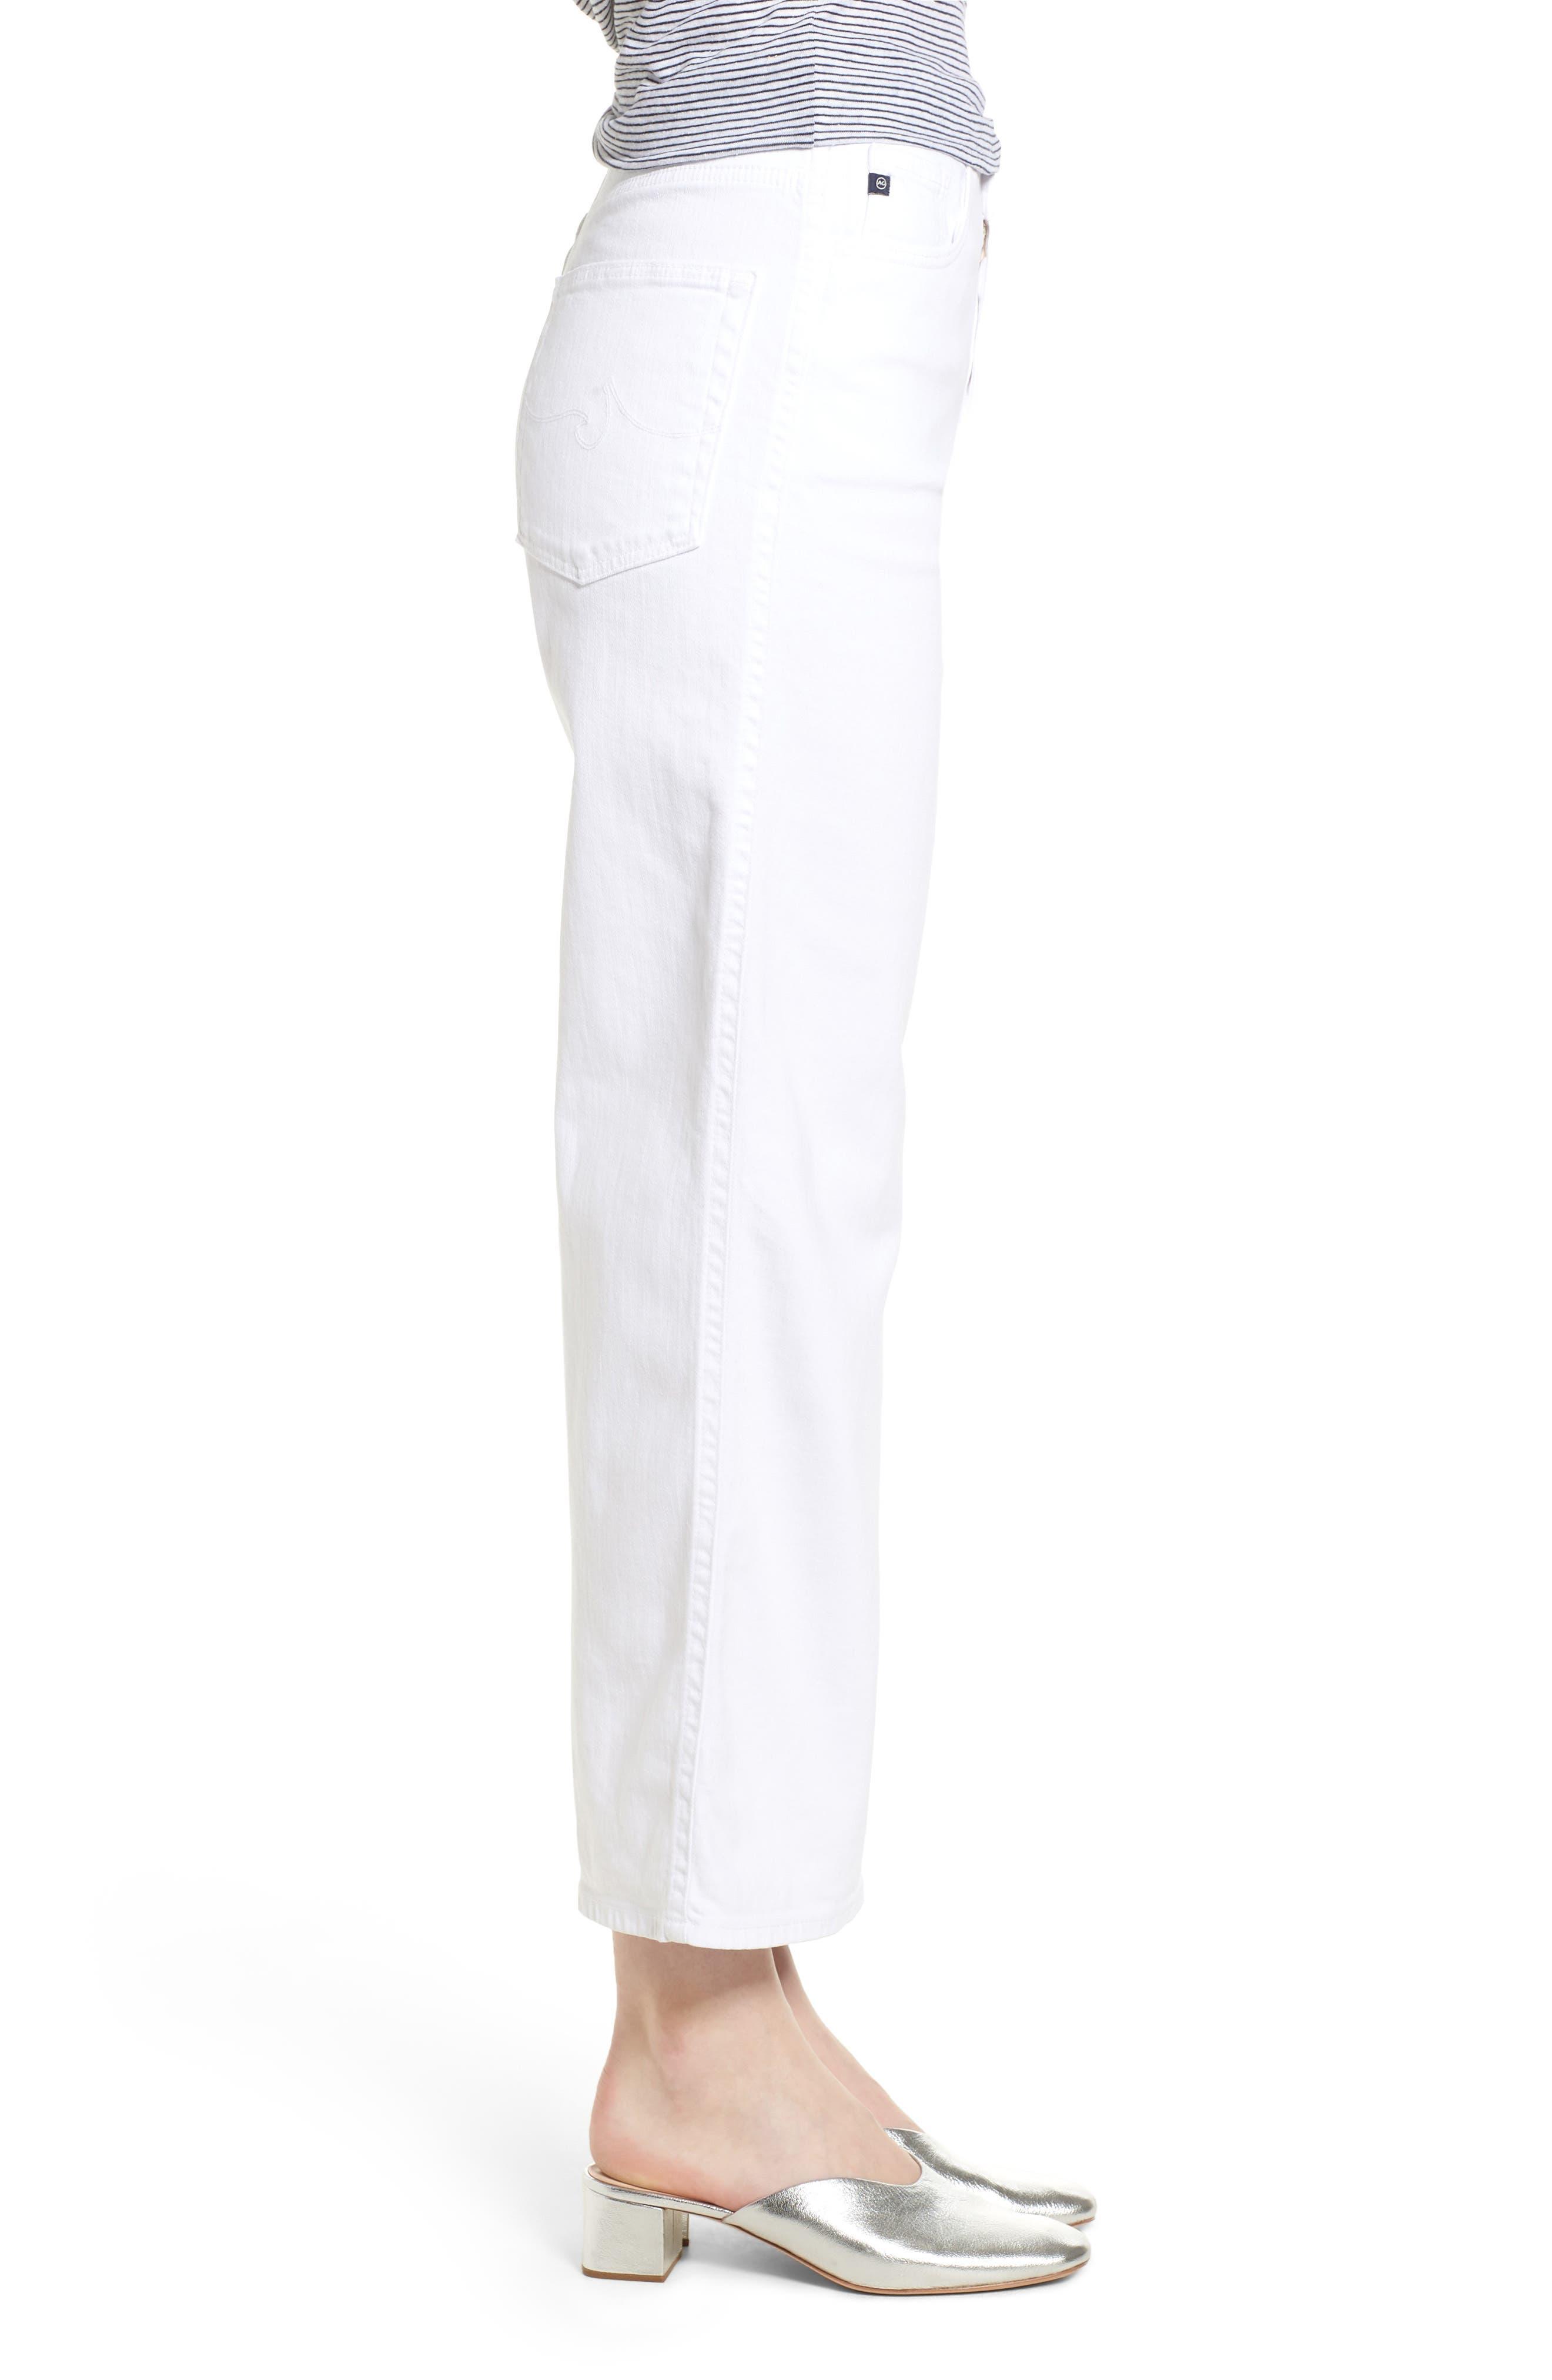 Etta High Waist Crop Wide Leg Jeans,                             Alternate thumbnail 3, color,                             110